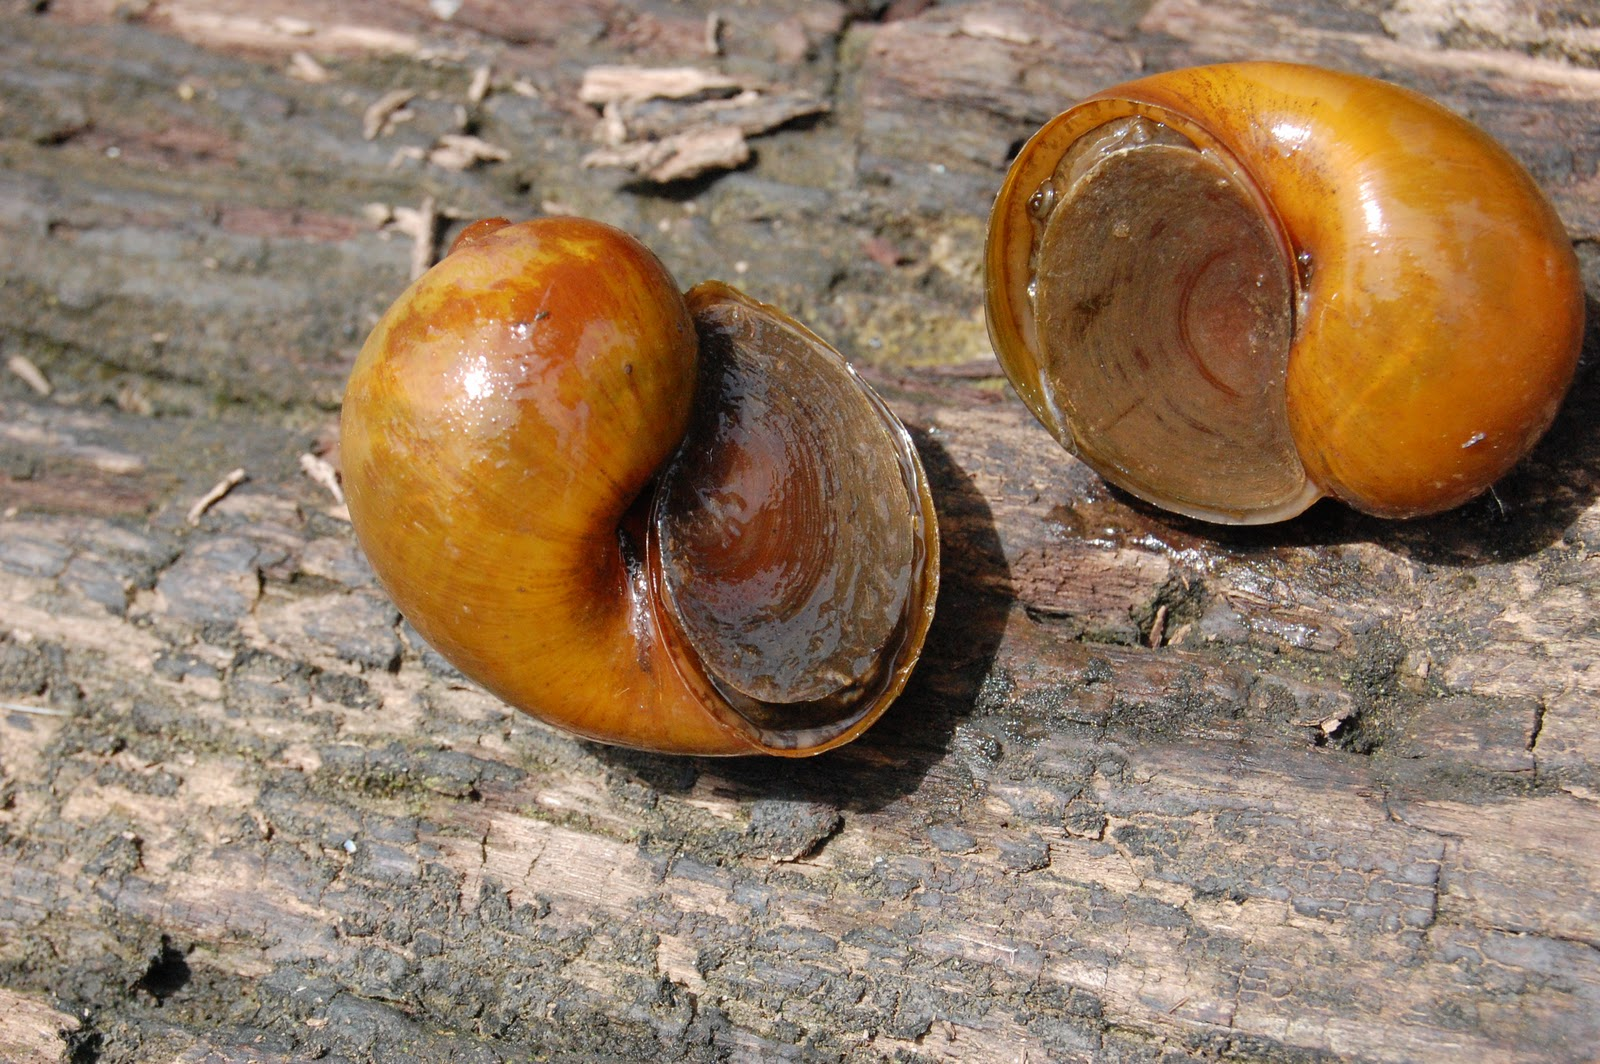 Apple snails Pomaceae sp . - invasive species found in Mesangat